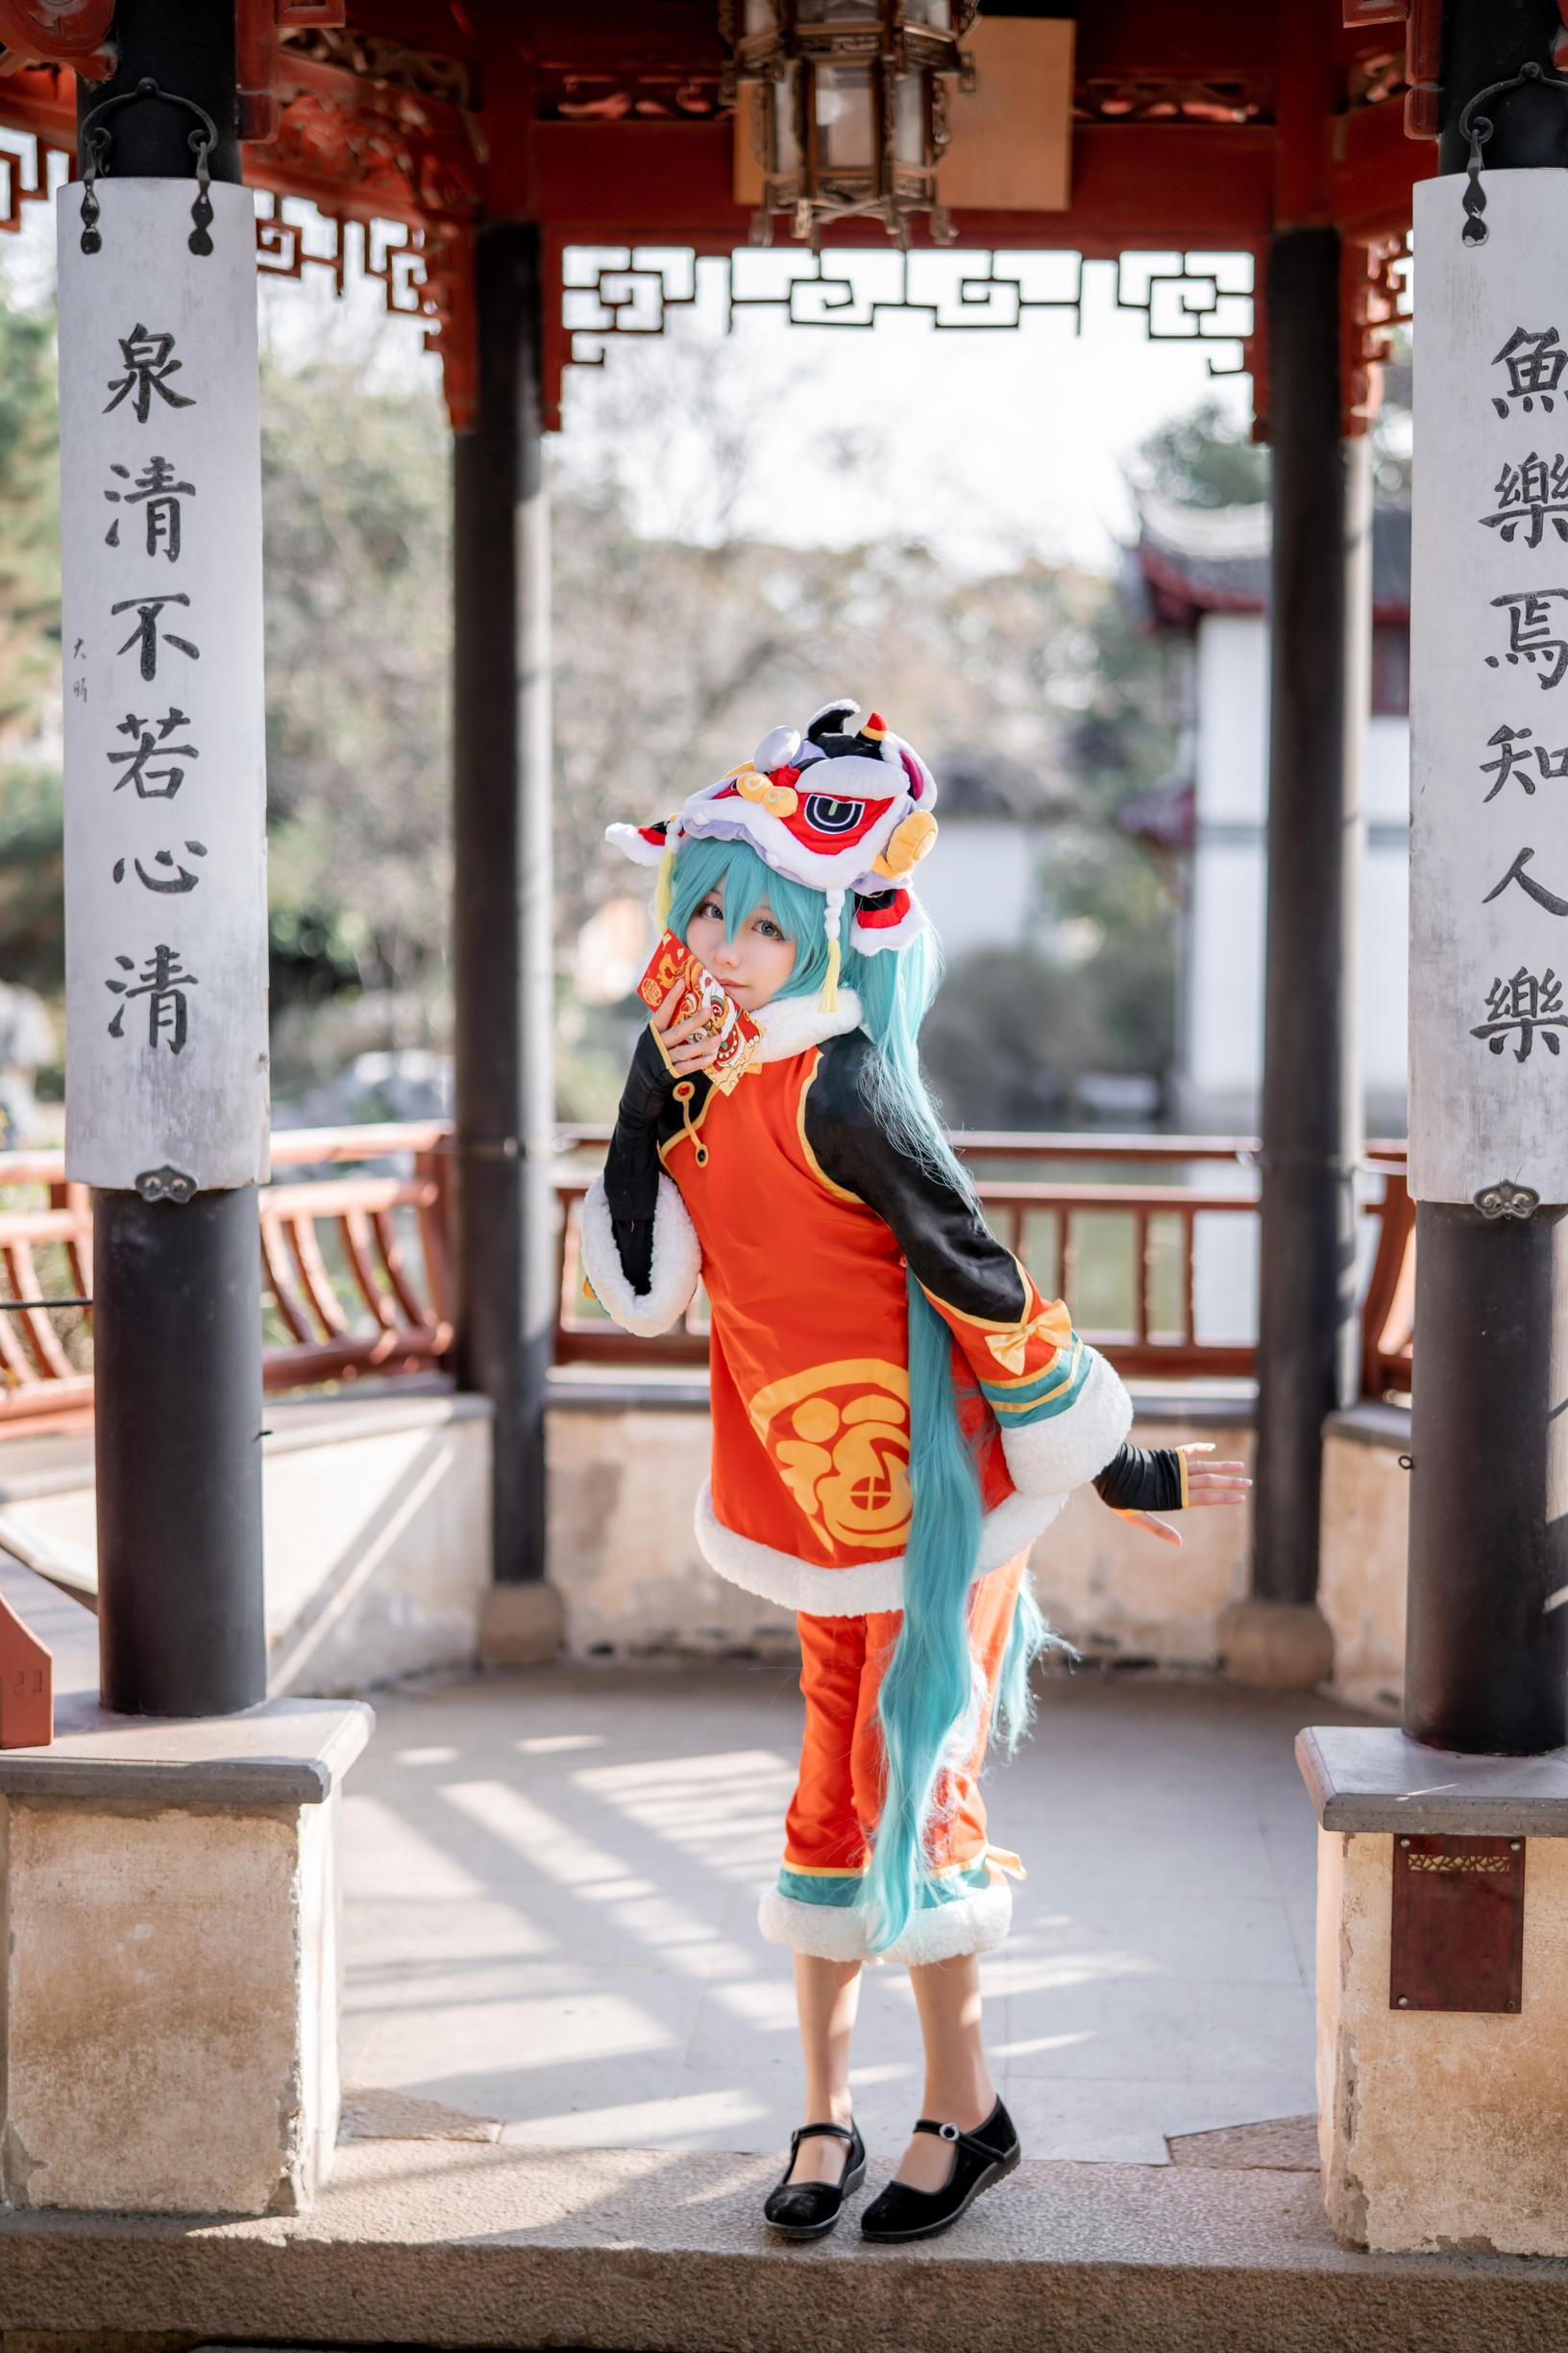 《VOCALOID》正片cosplay【CN:_天小然_】-第1张